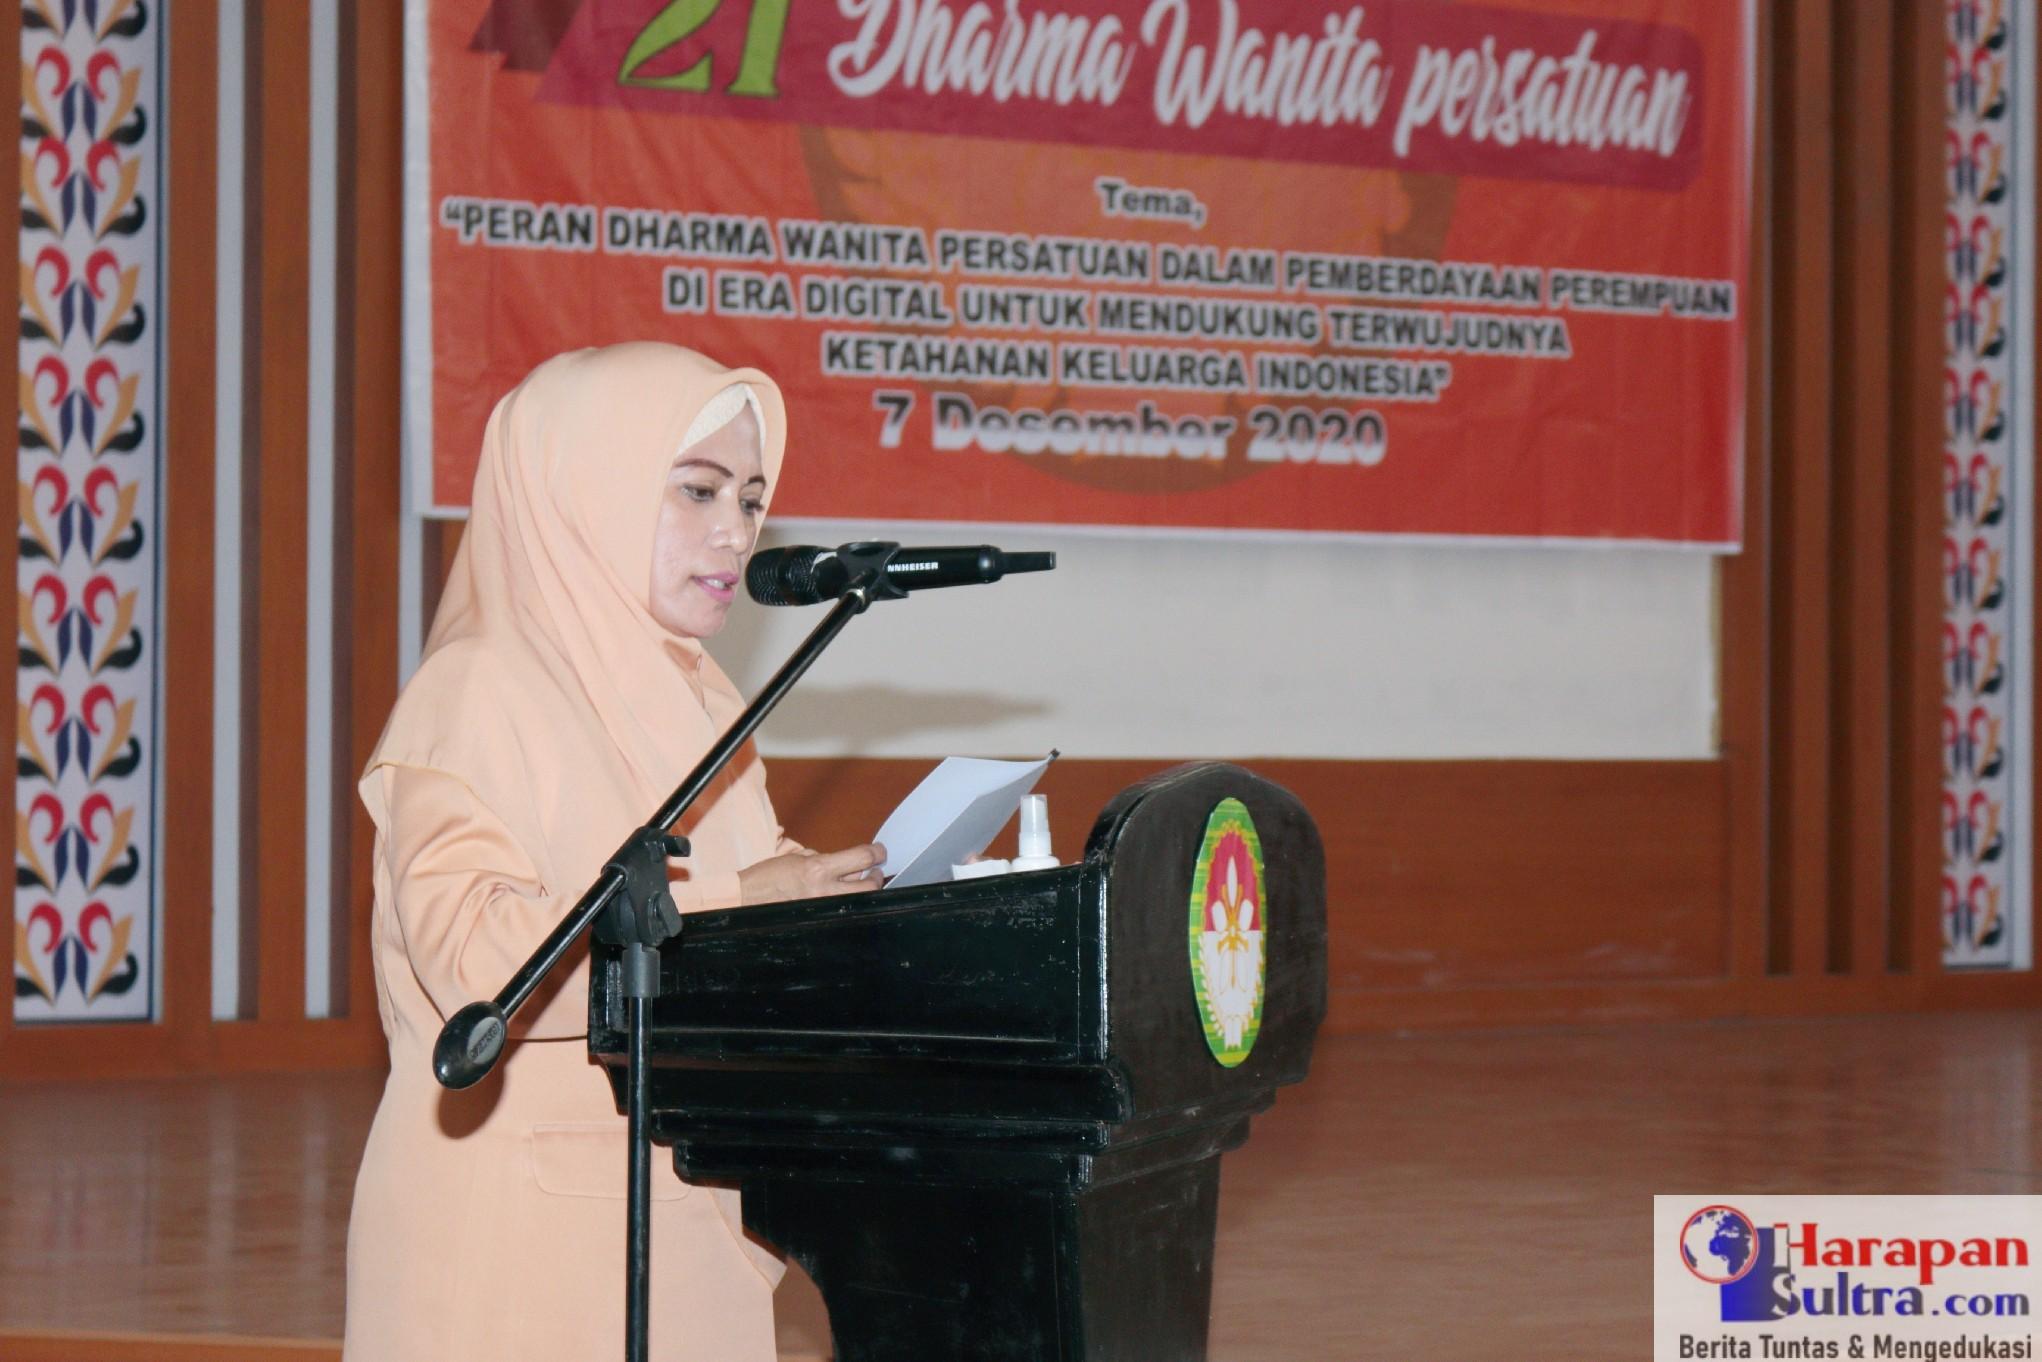 Anggota DPD-RI, Hj. Andi Nirwana Sebbu (ANS) saat memberikan sambutan pada HUT Dharma Wanita Persatuan Tingkat Kabupaten Bombana